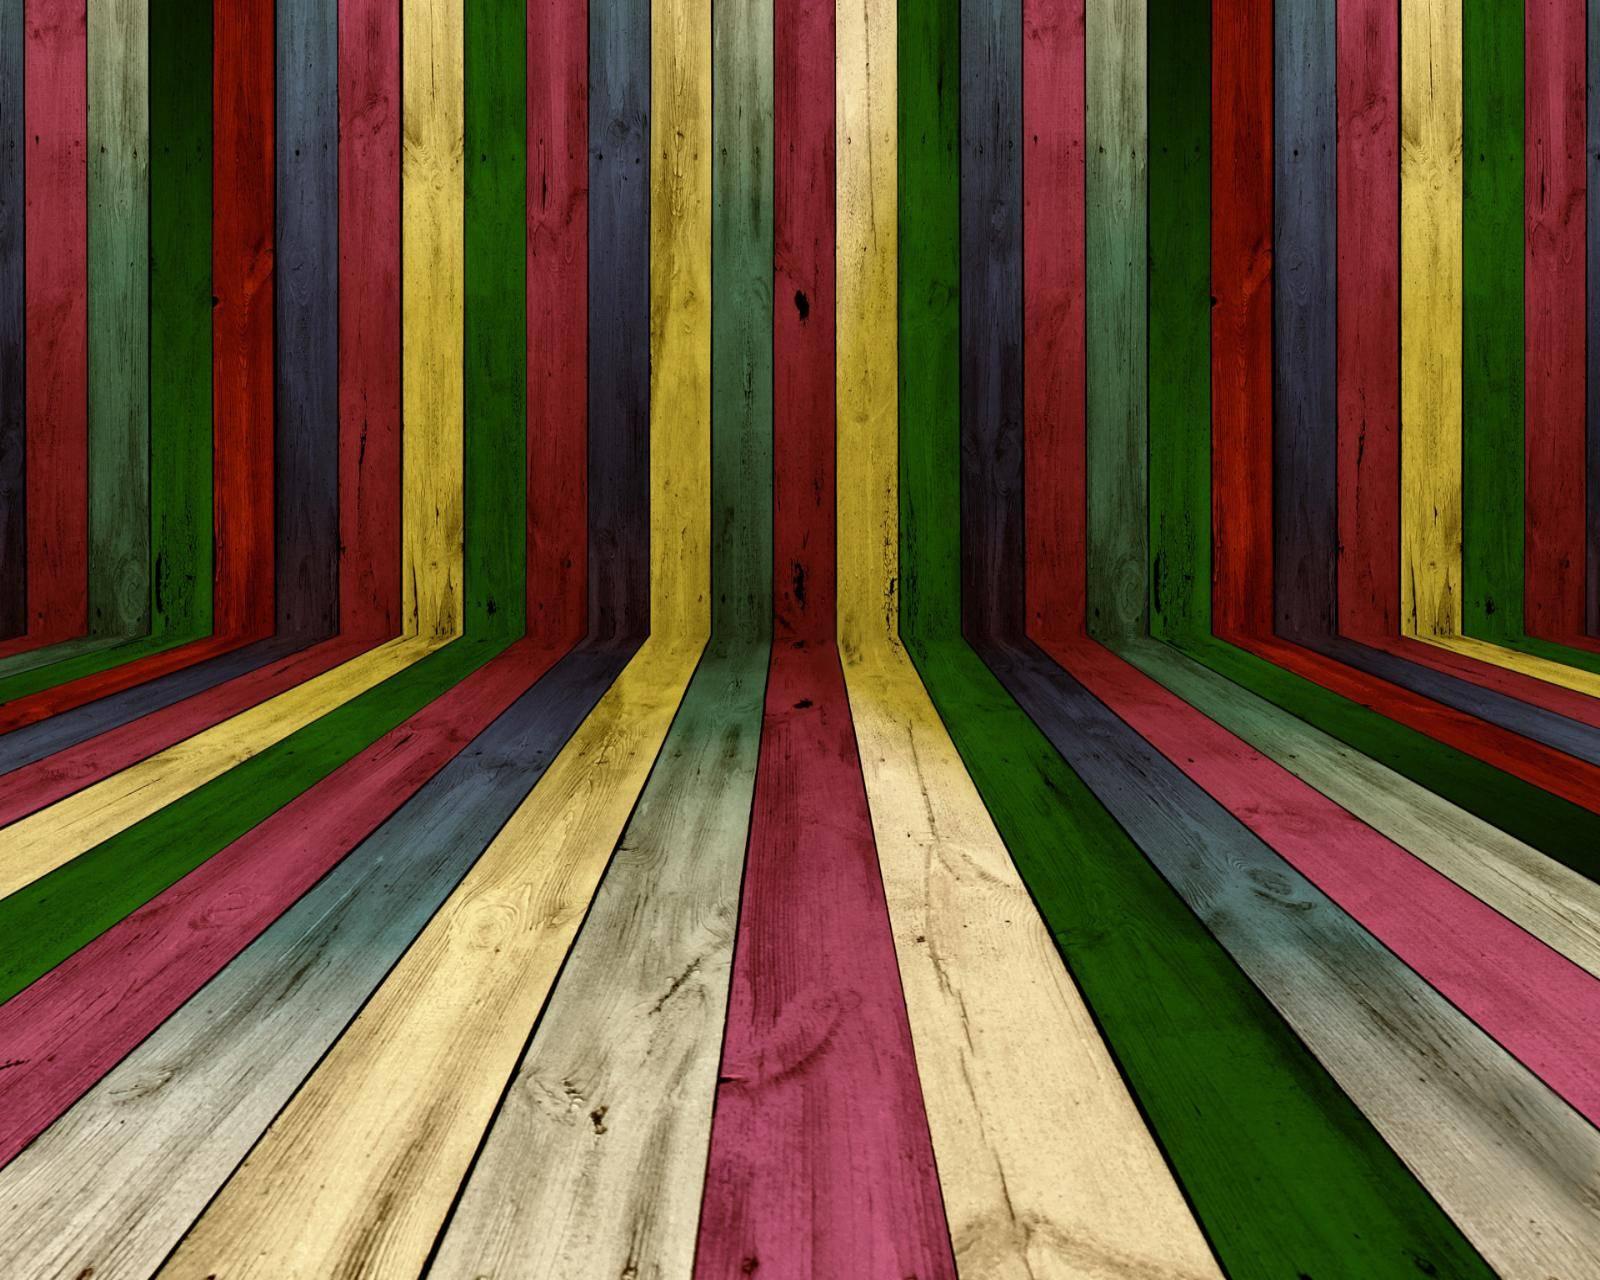 colorful wood